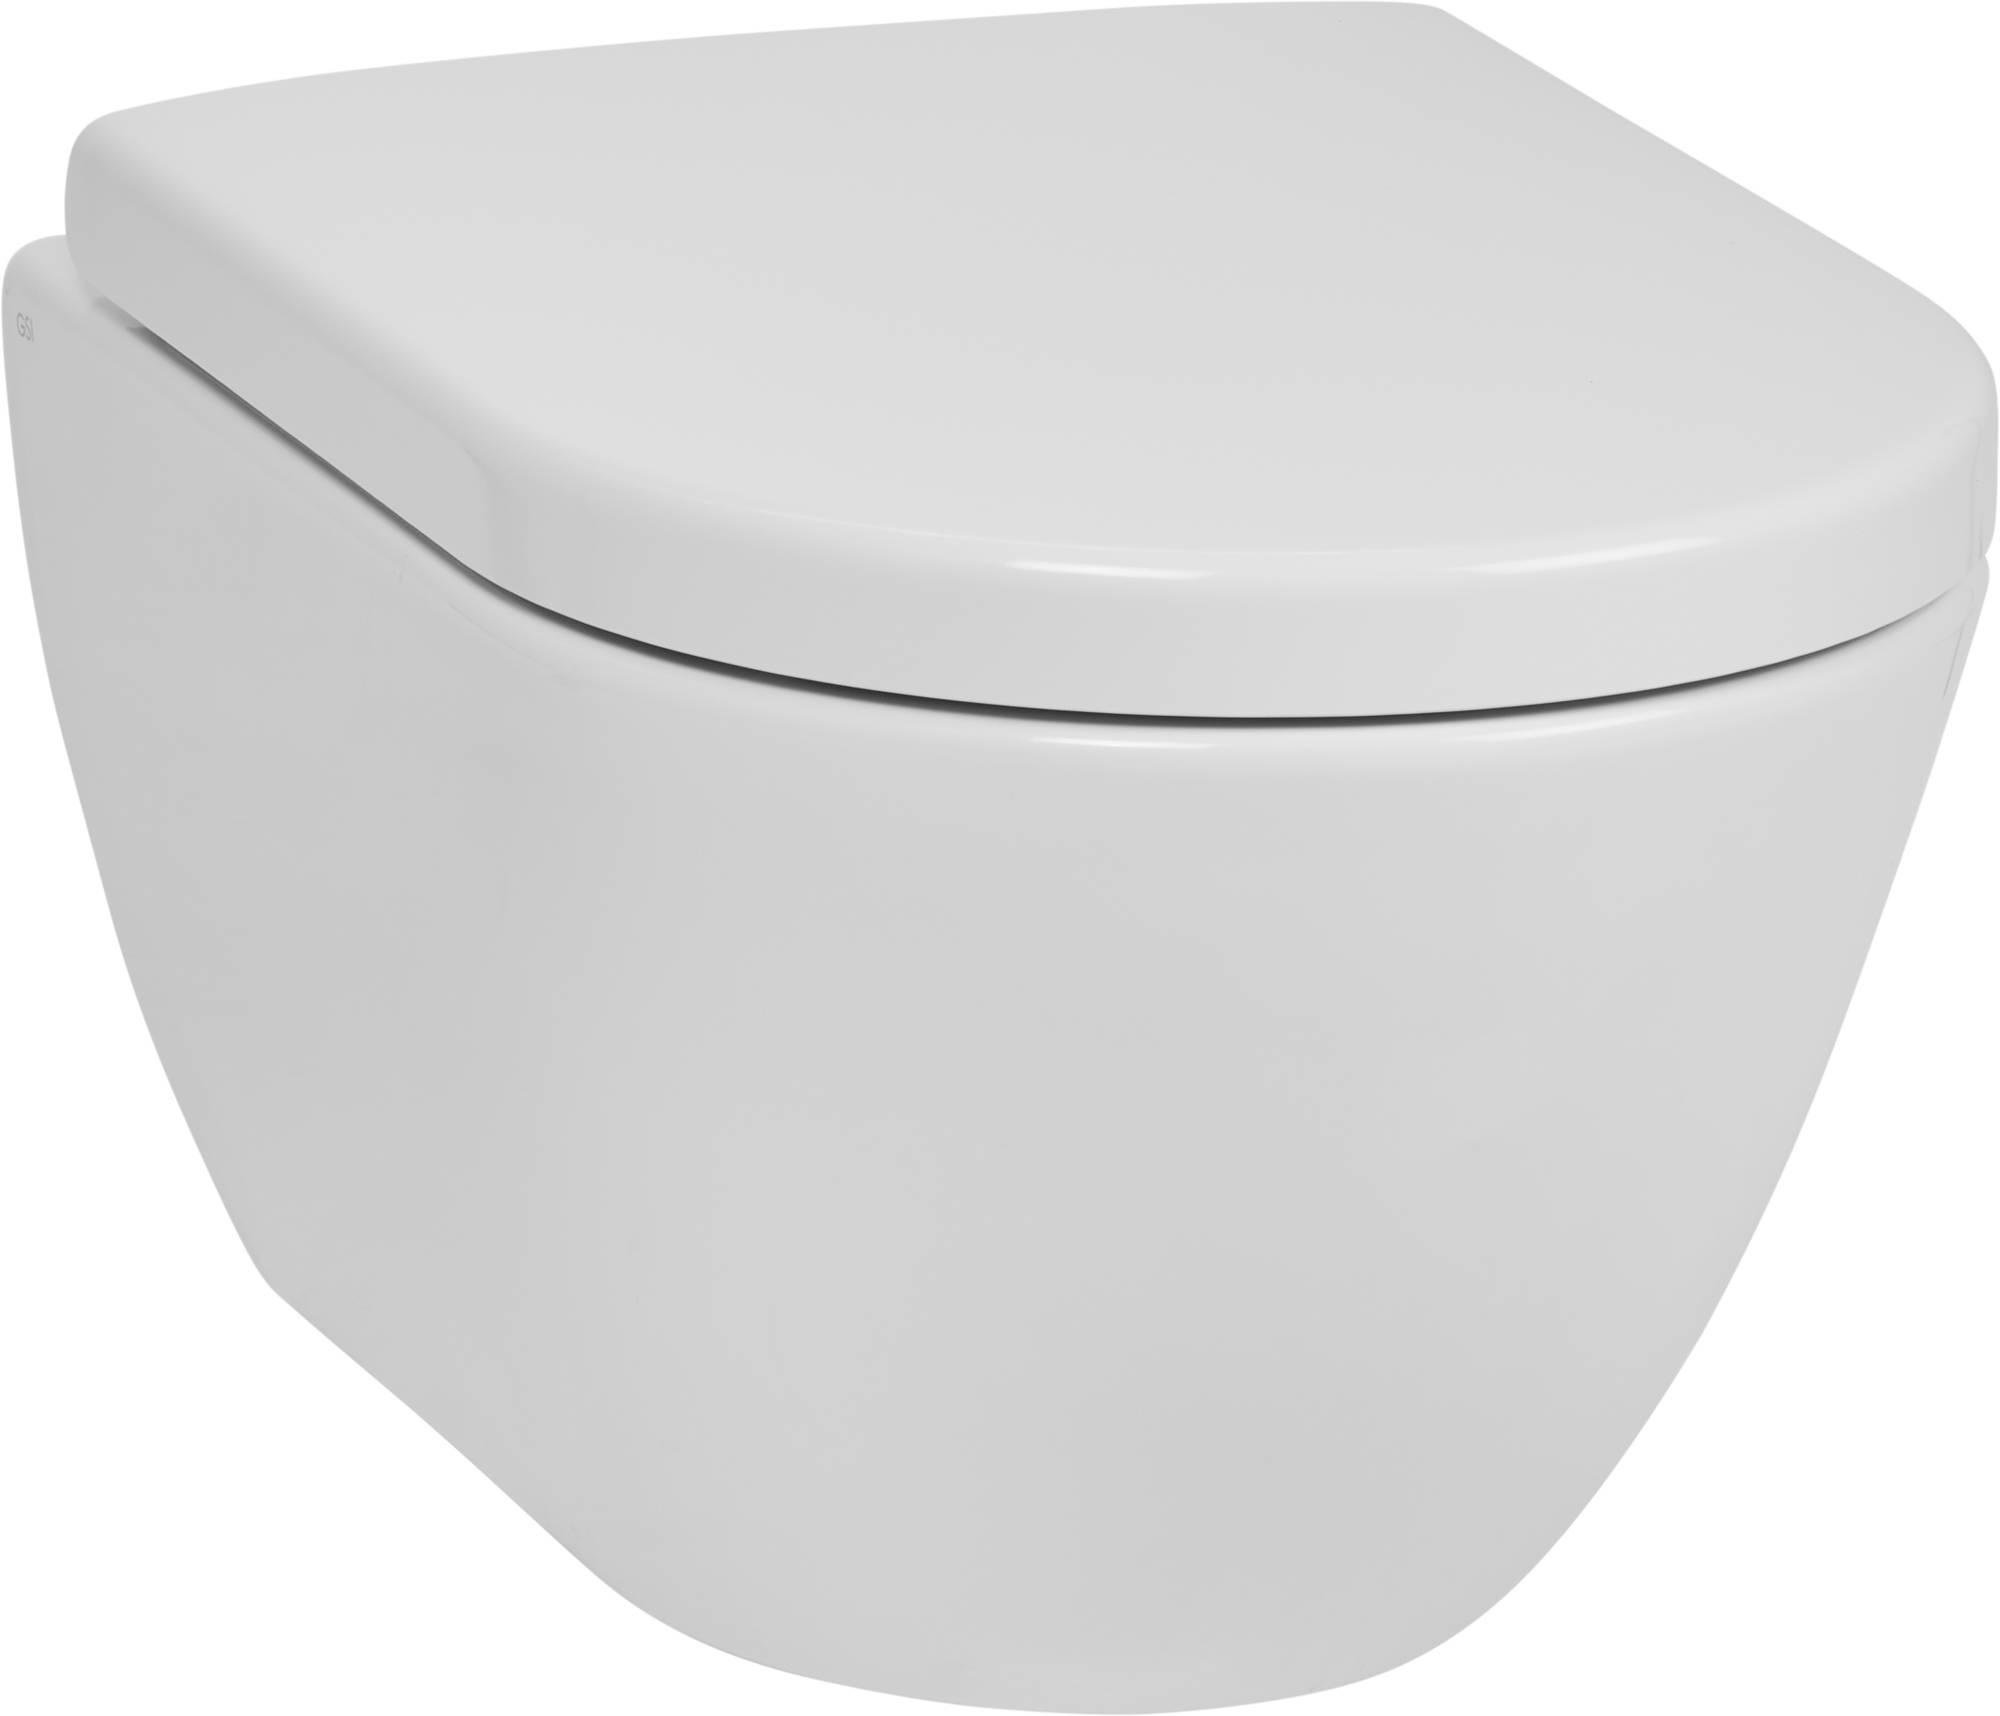 Ben Segno wandcloset 50x36 cm Compact Free Flush, incl. bevestiging